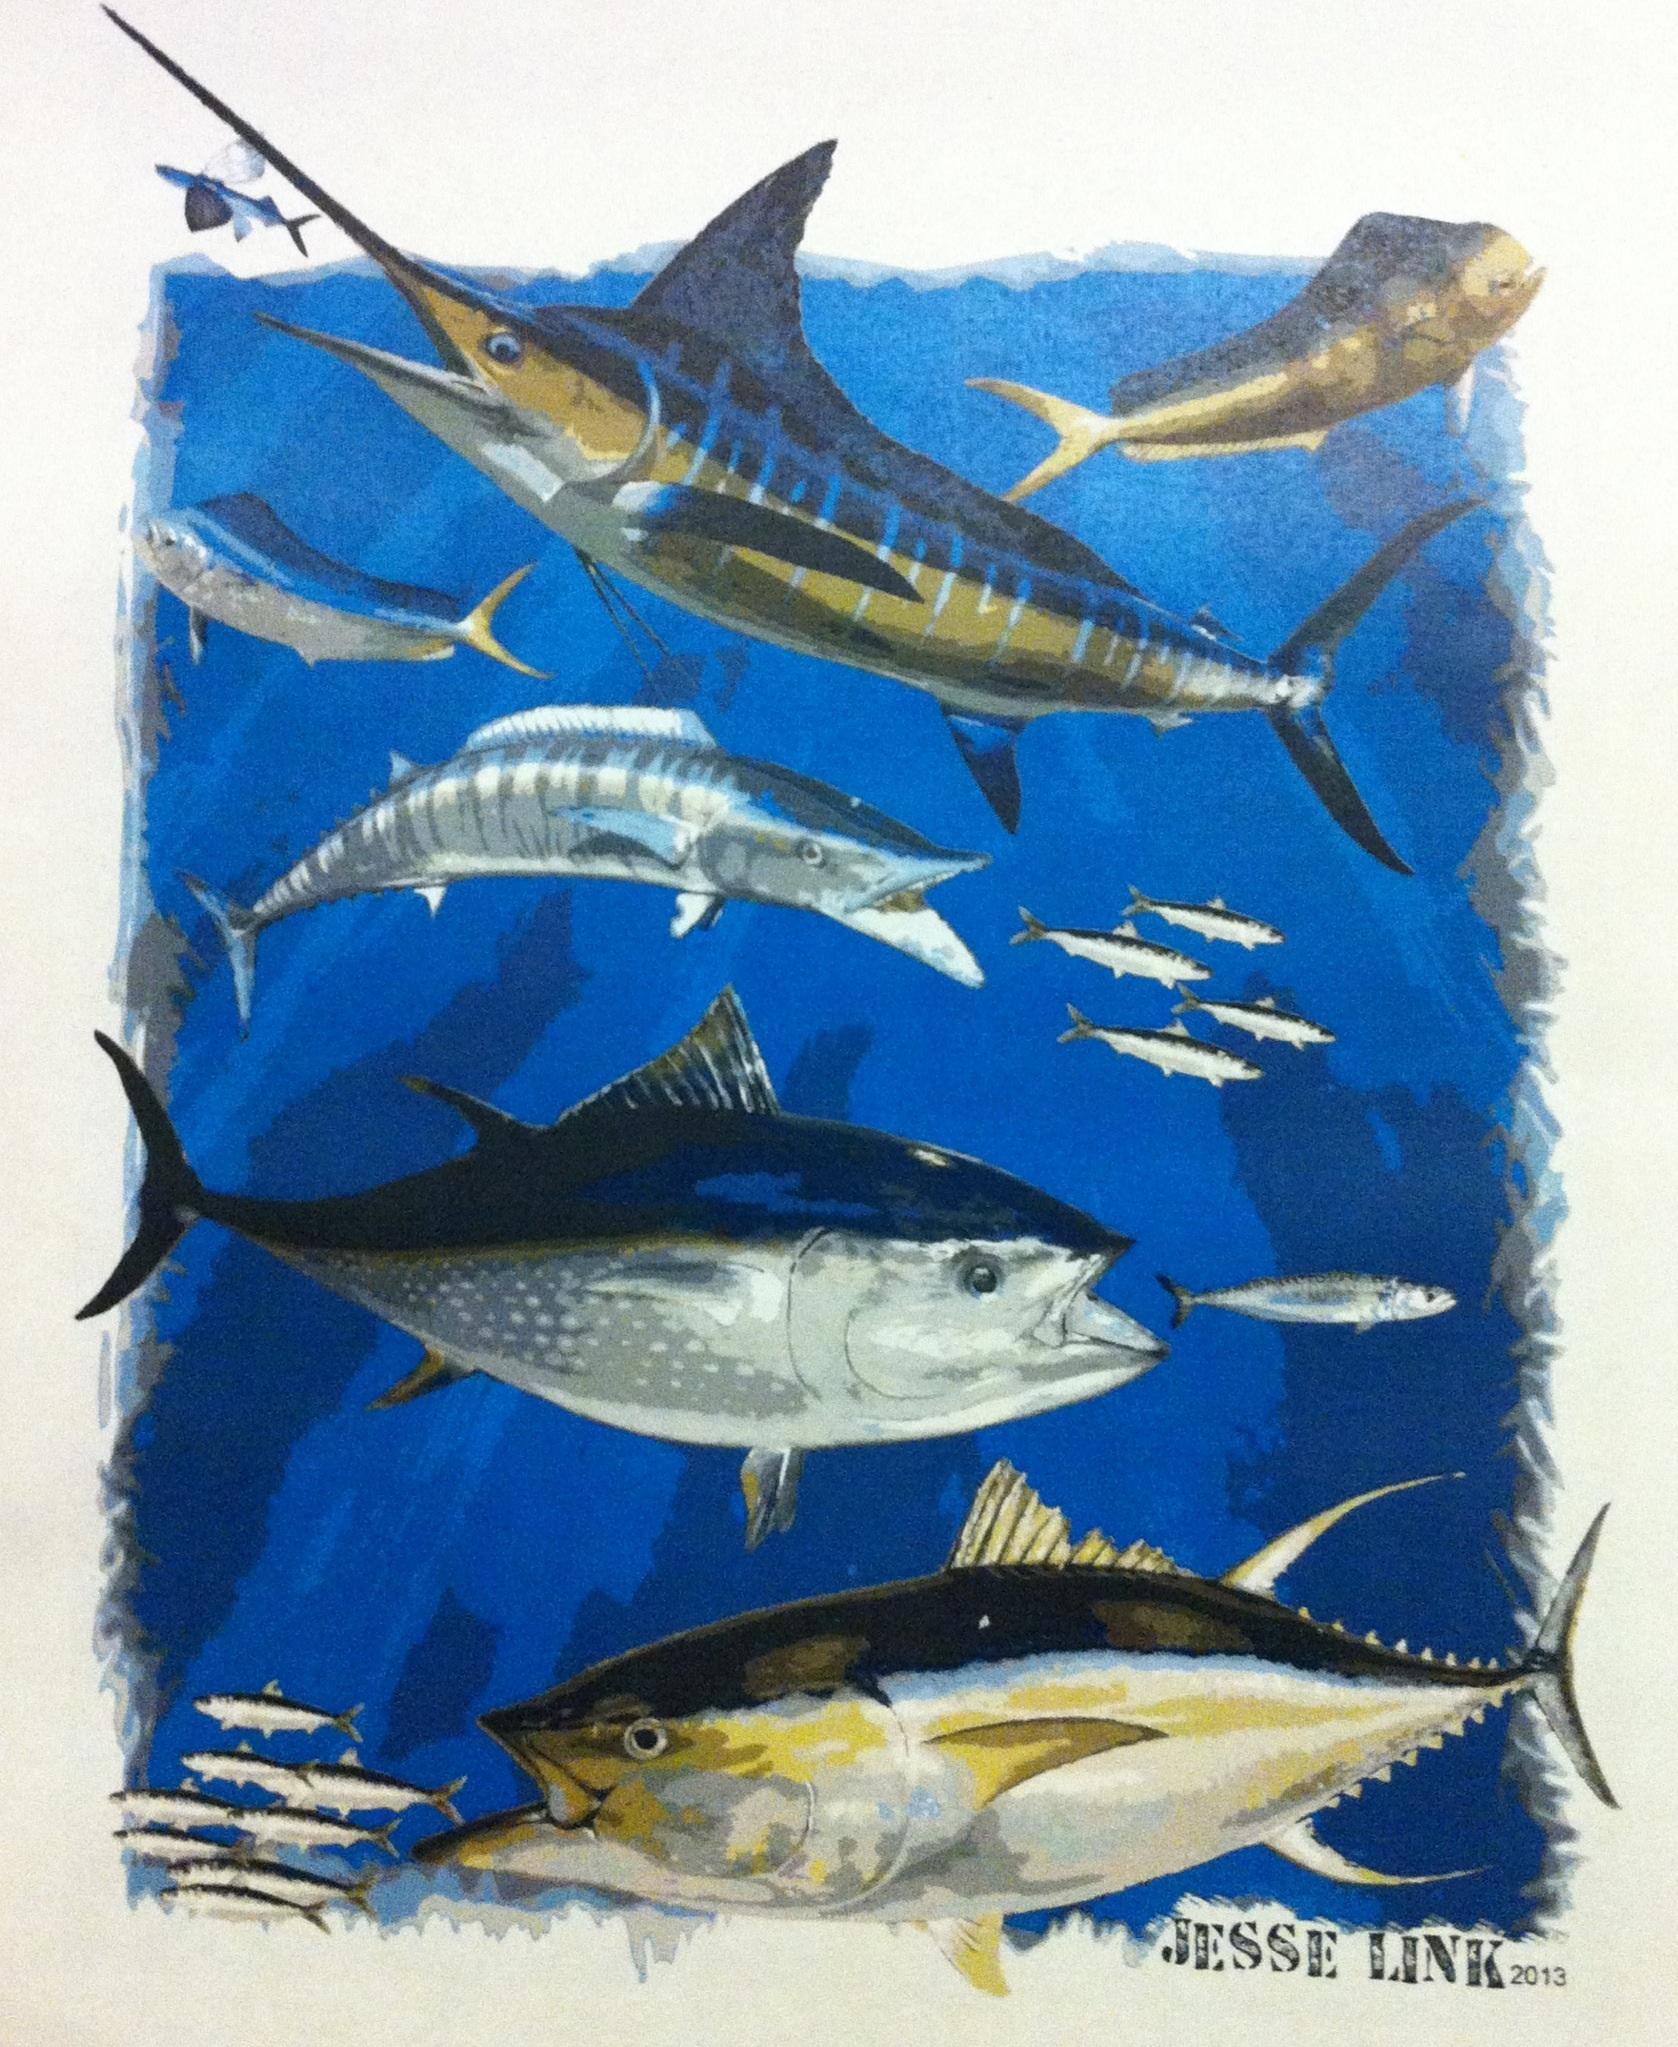 New fishing shirts com high quality custom and stock for Fishing shirt designs